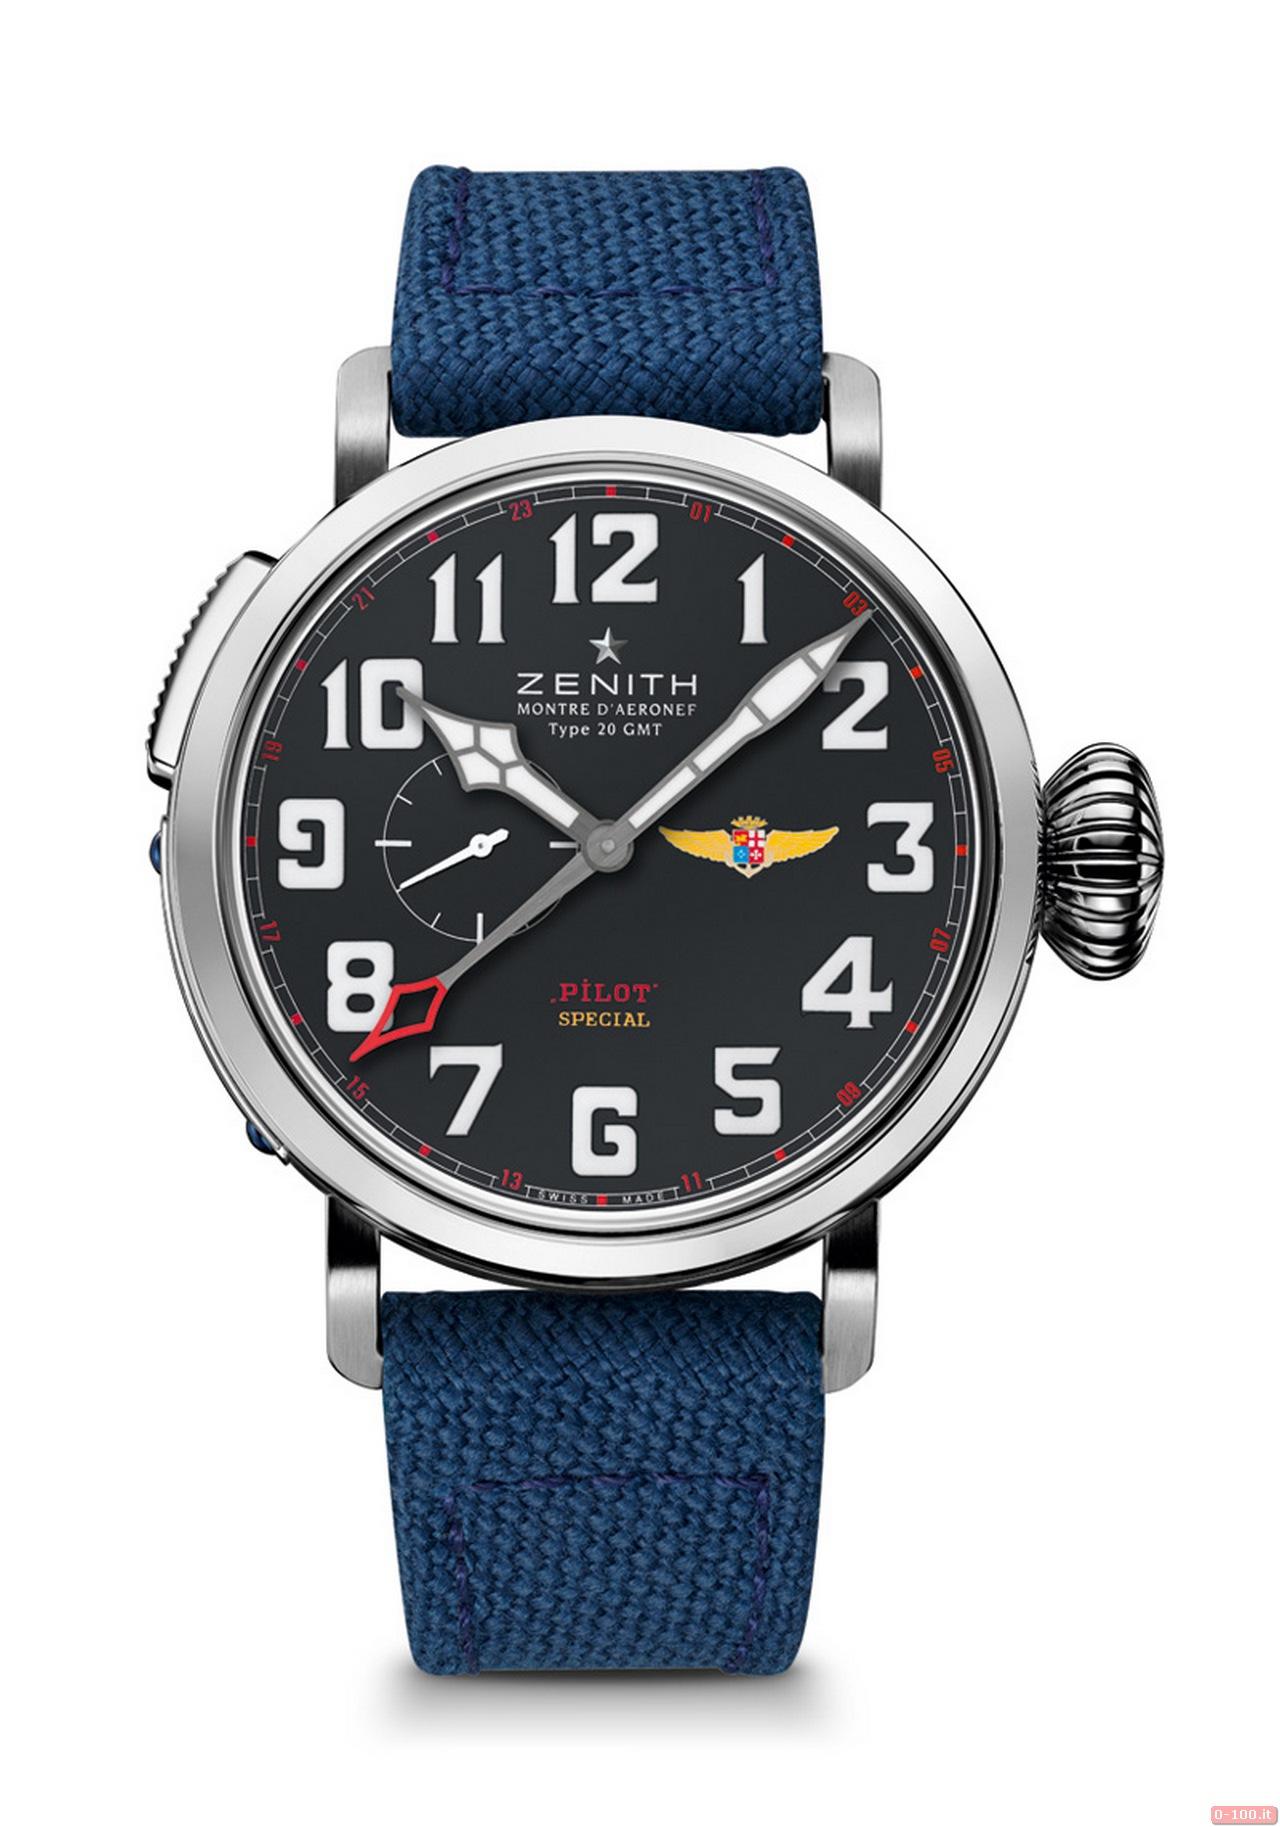 zenith-pilot-montre-daeronef-type-20-gmt-0-100_1